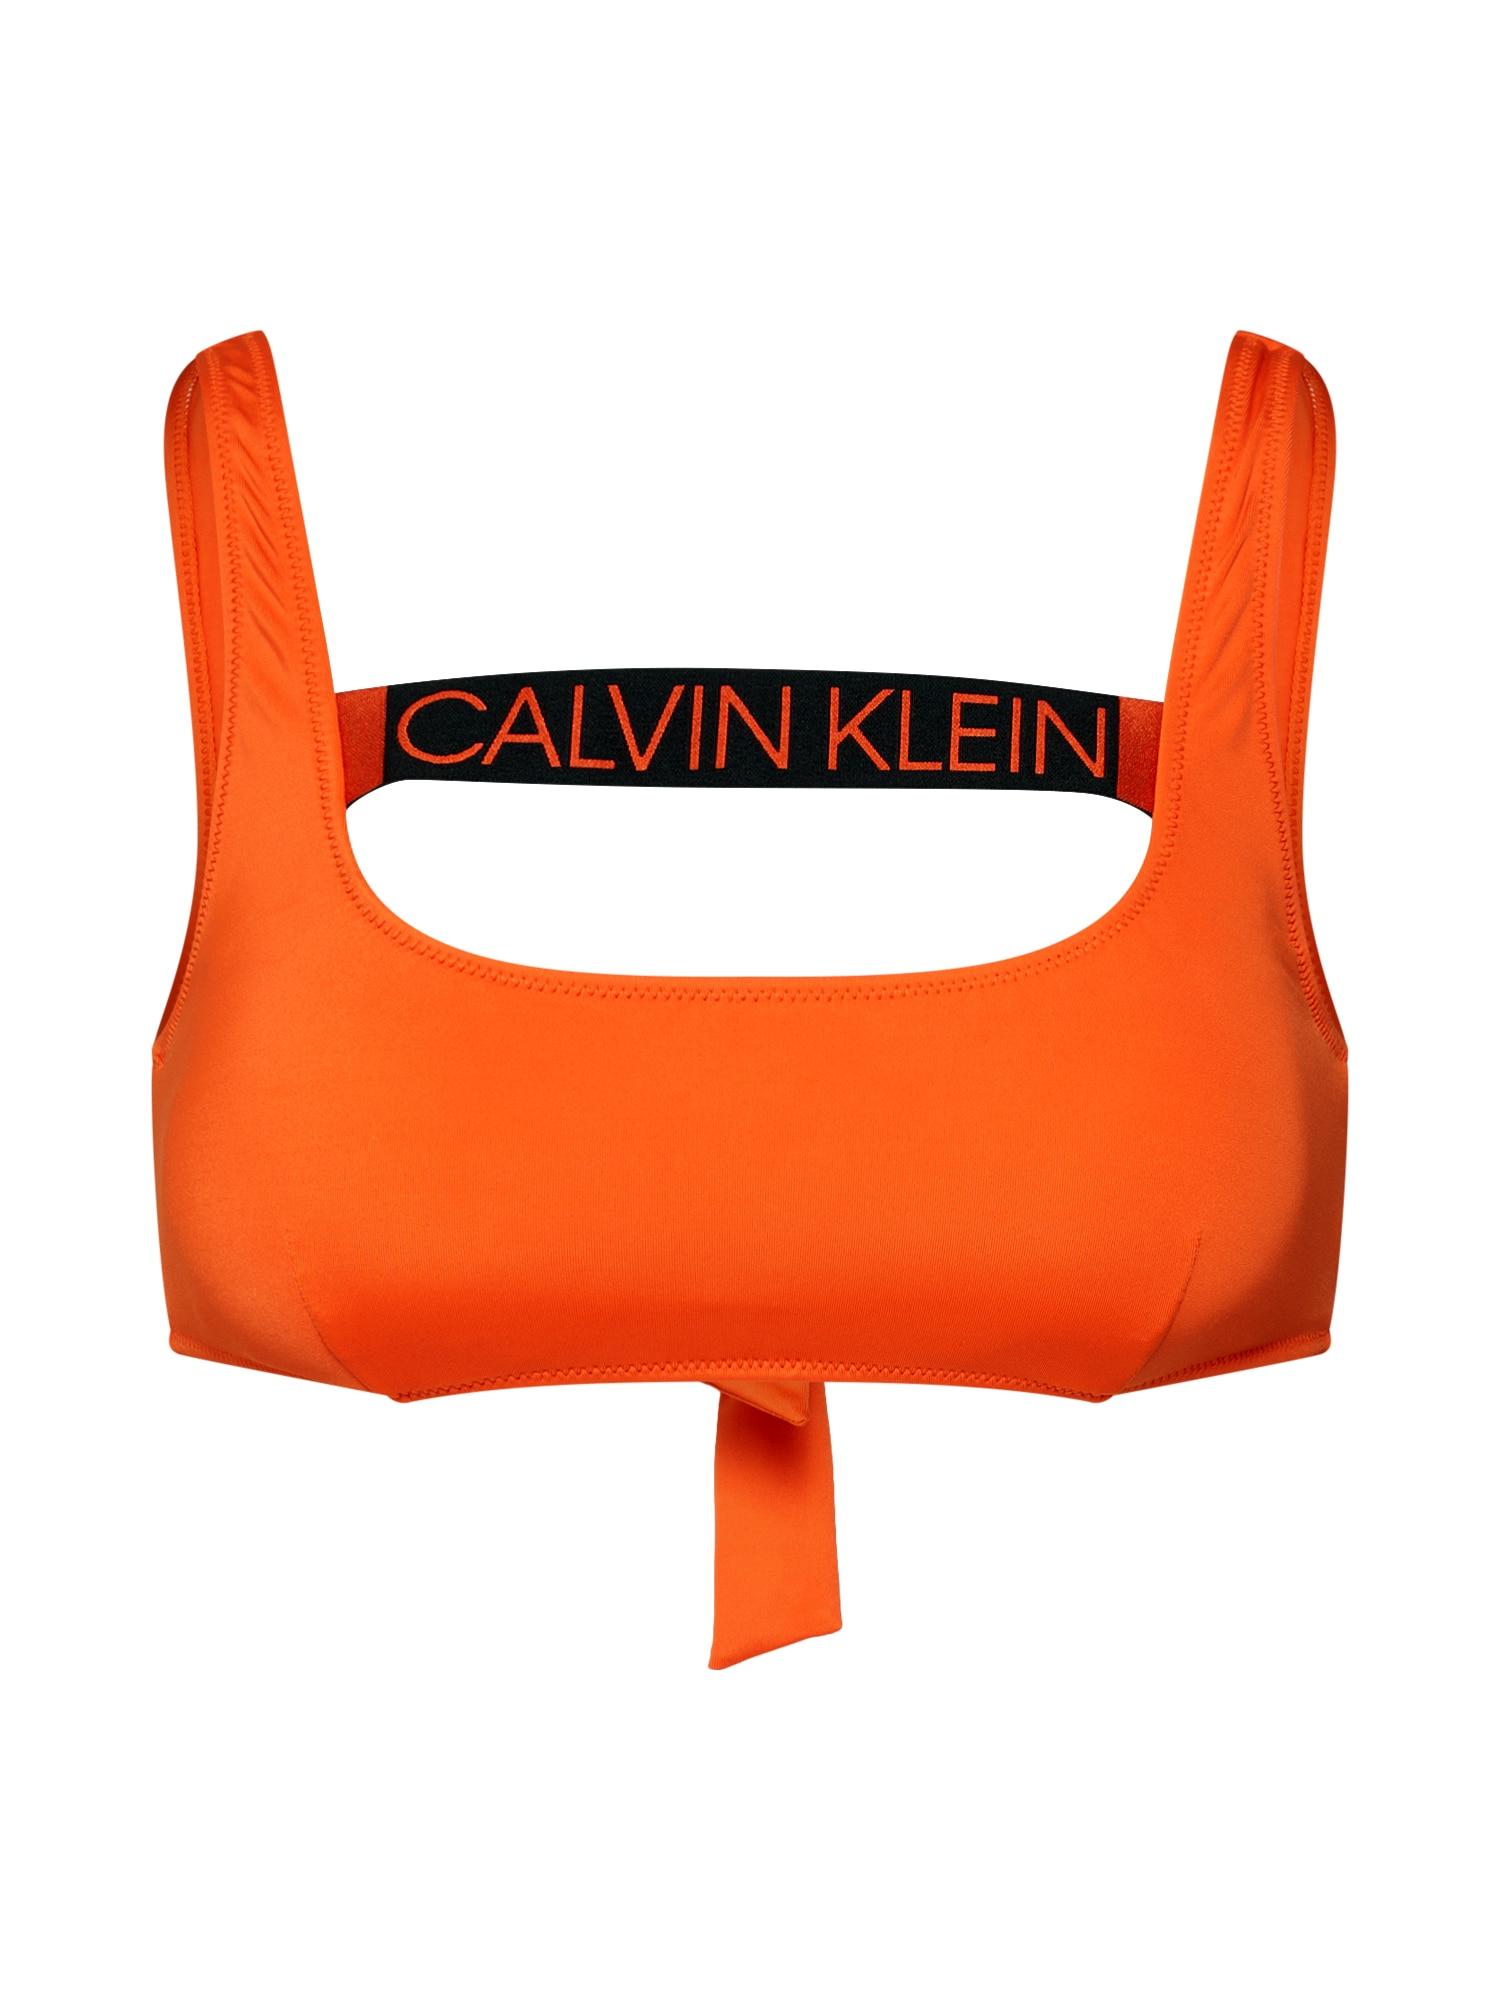 Horní díl plavek TIE BACK BRALETTE RP tmavě oranžová Calvin Klein Swimwear